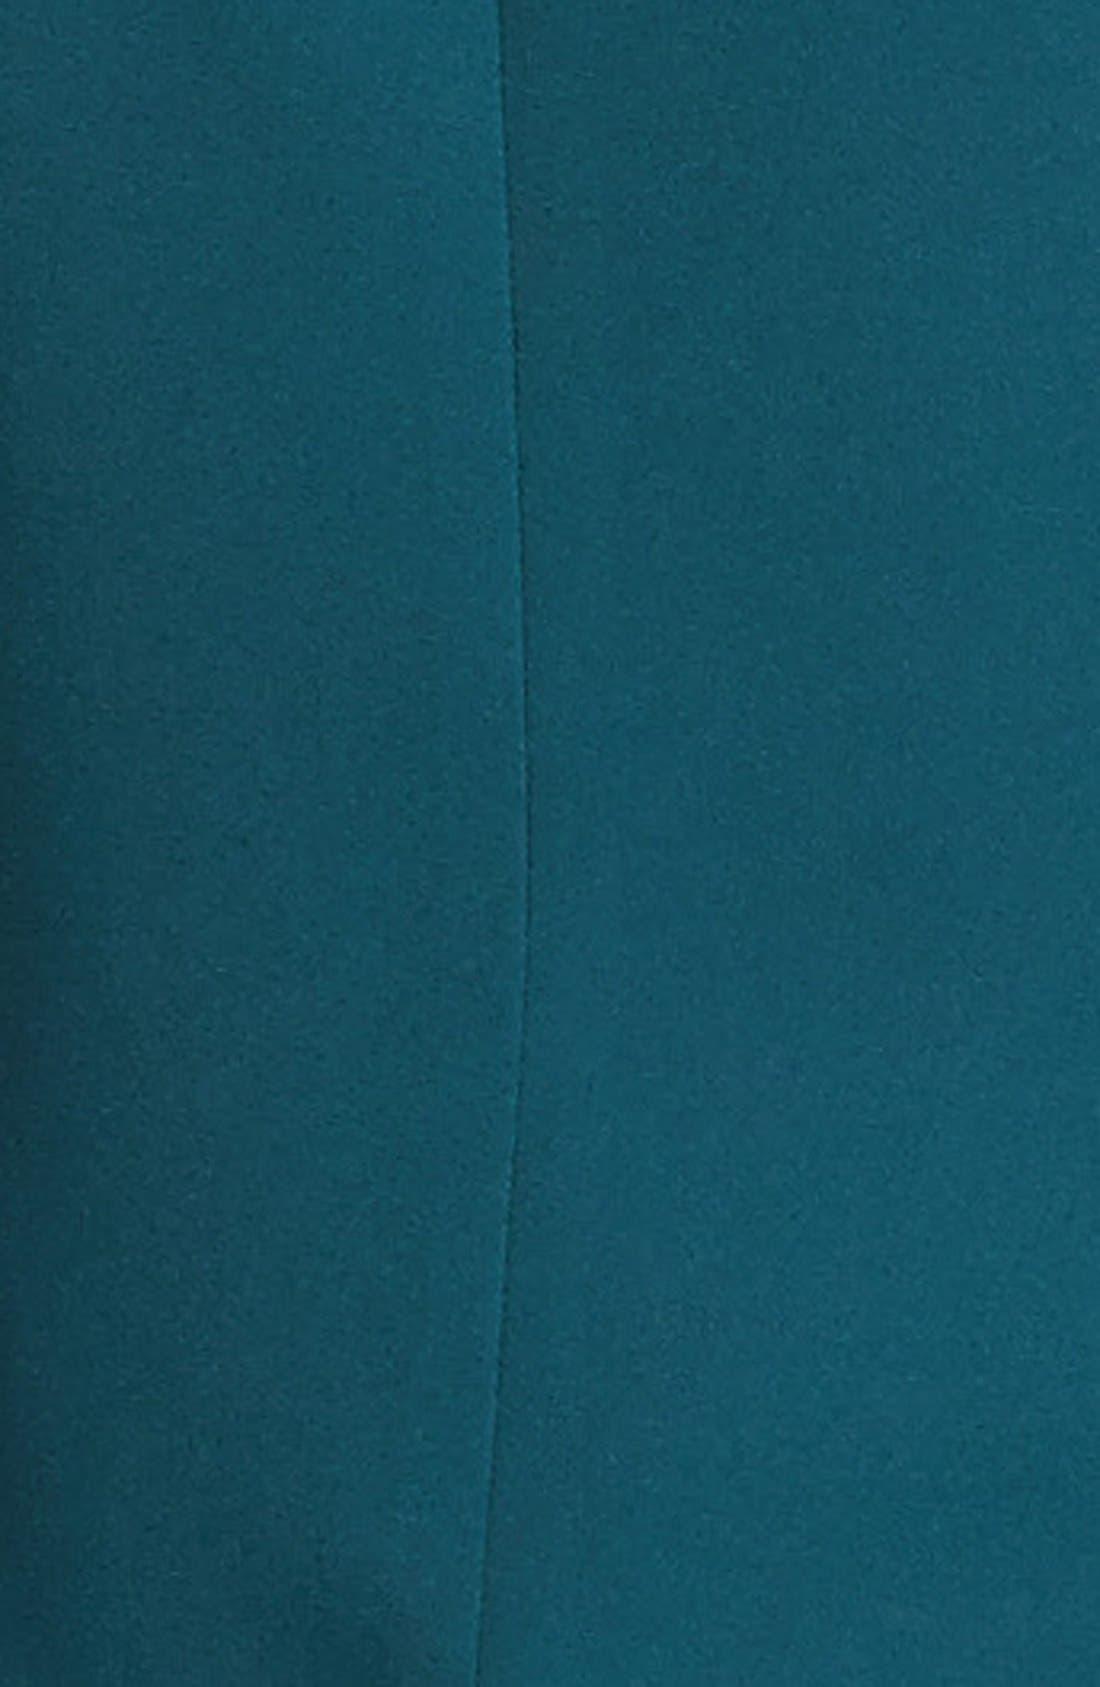 Alternate Image 3  - MARC BY MARC JACOBS 'Sparks' Crepe Jacket